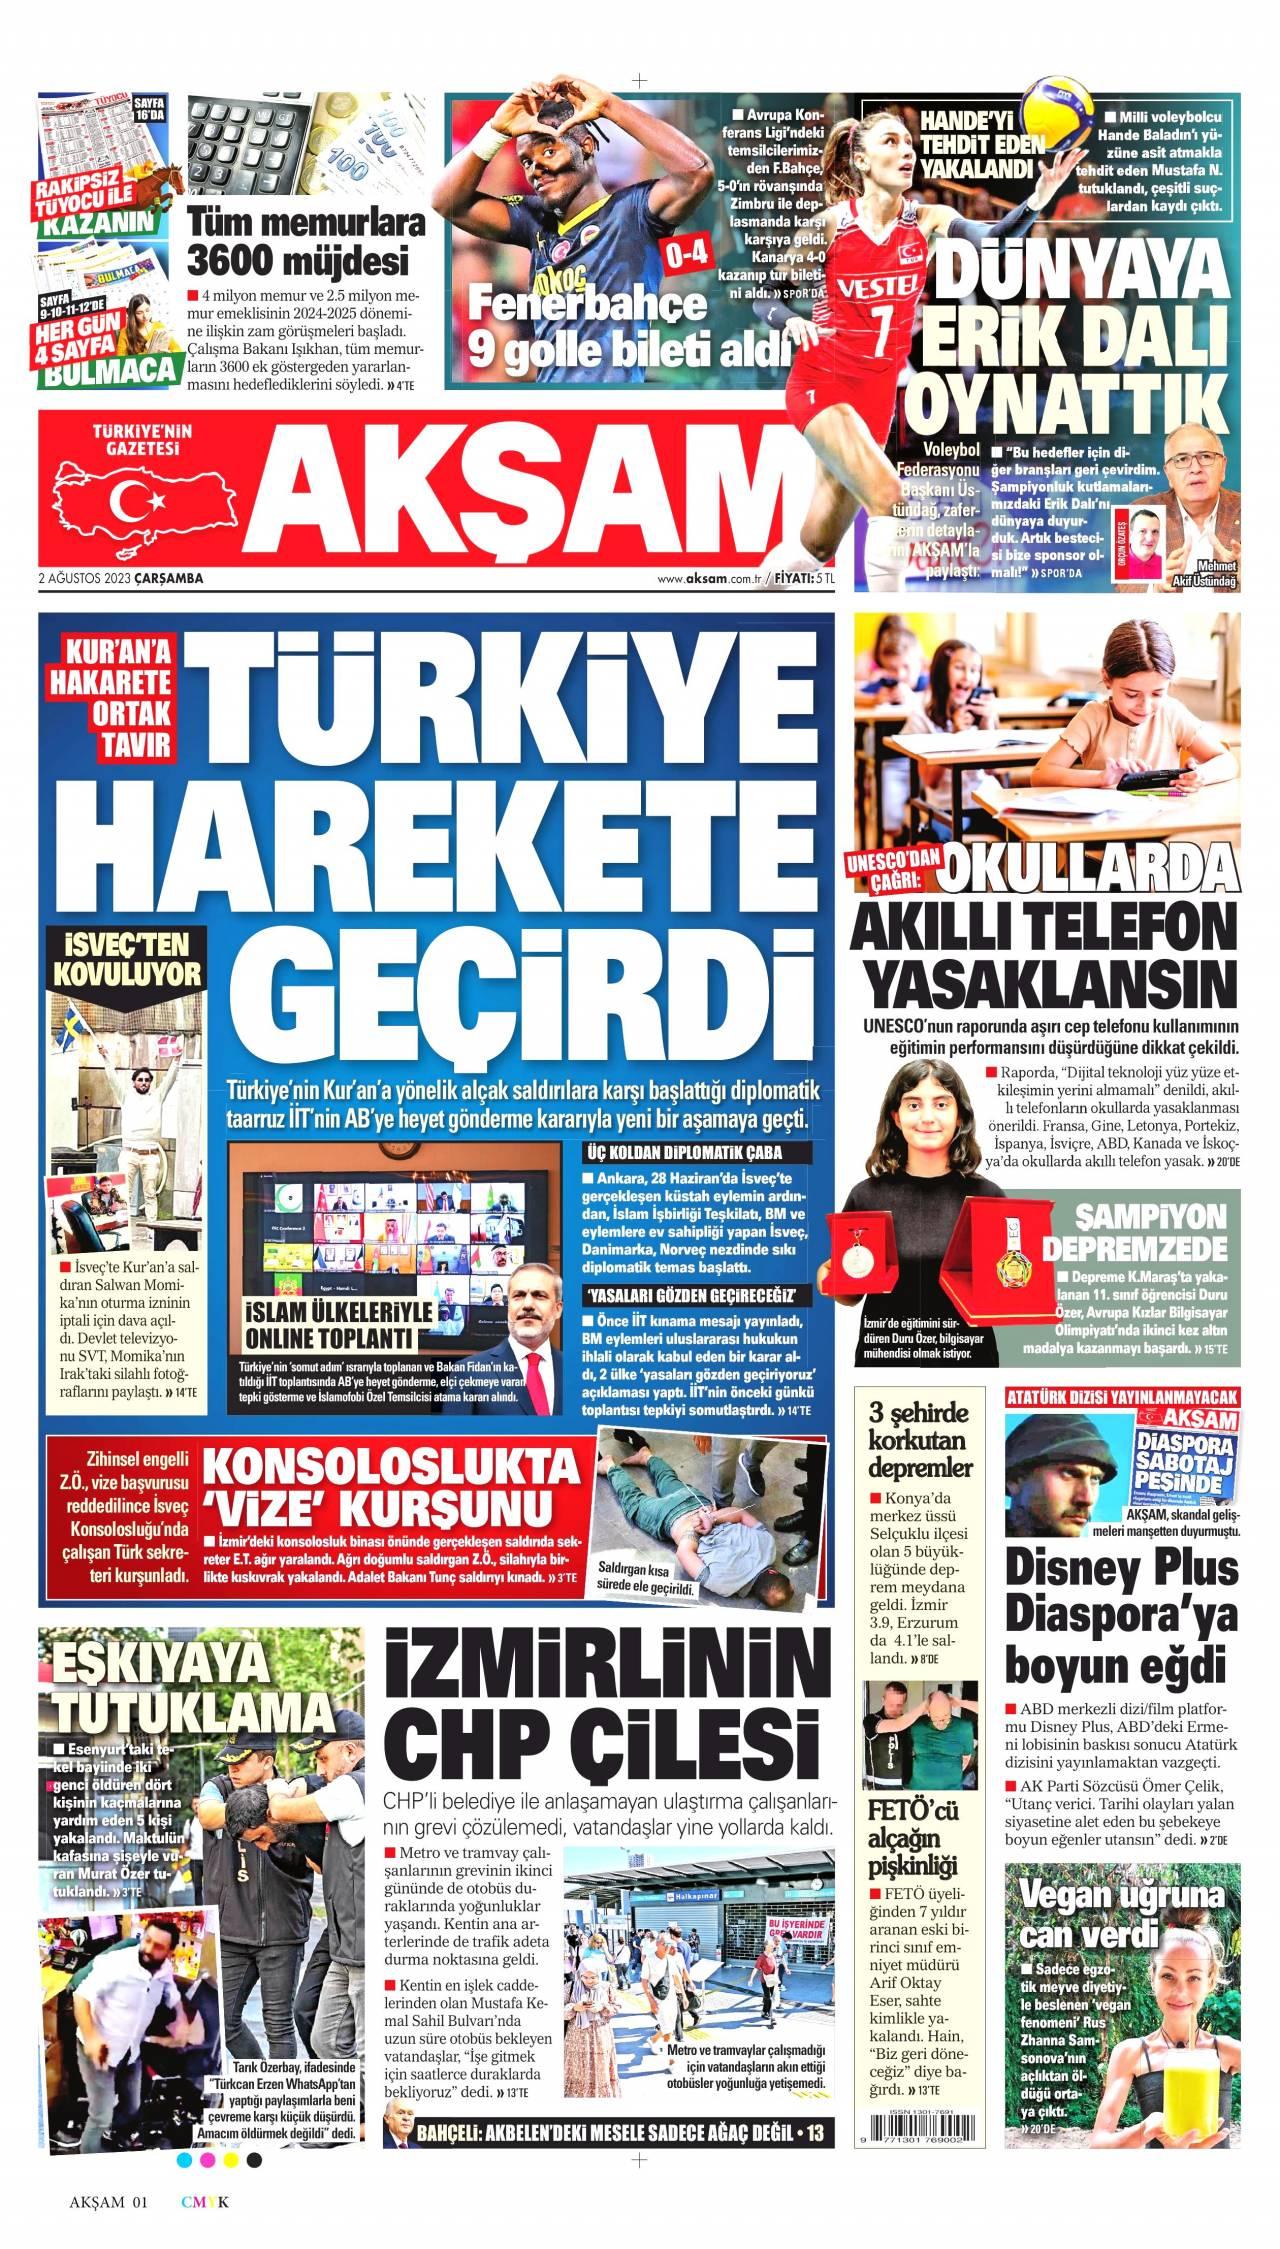 Akşam Gazetesi Gazetesi